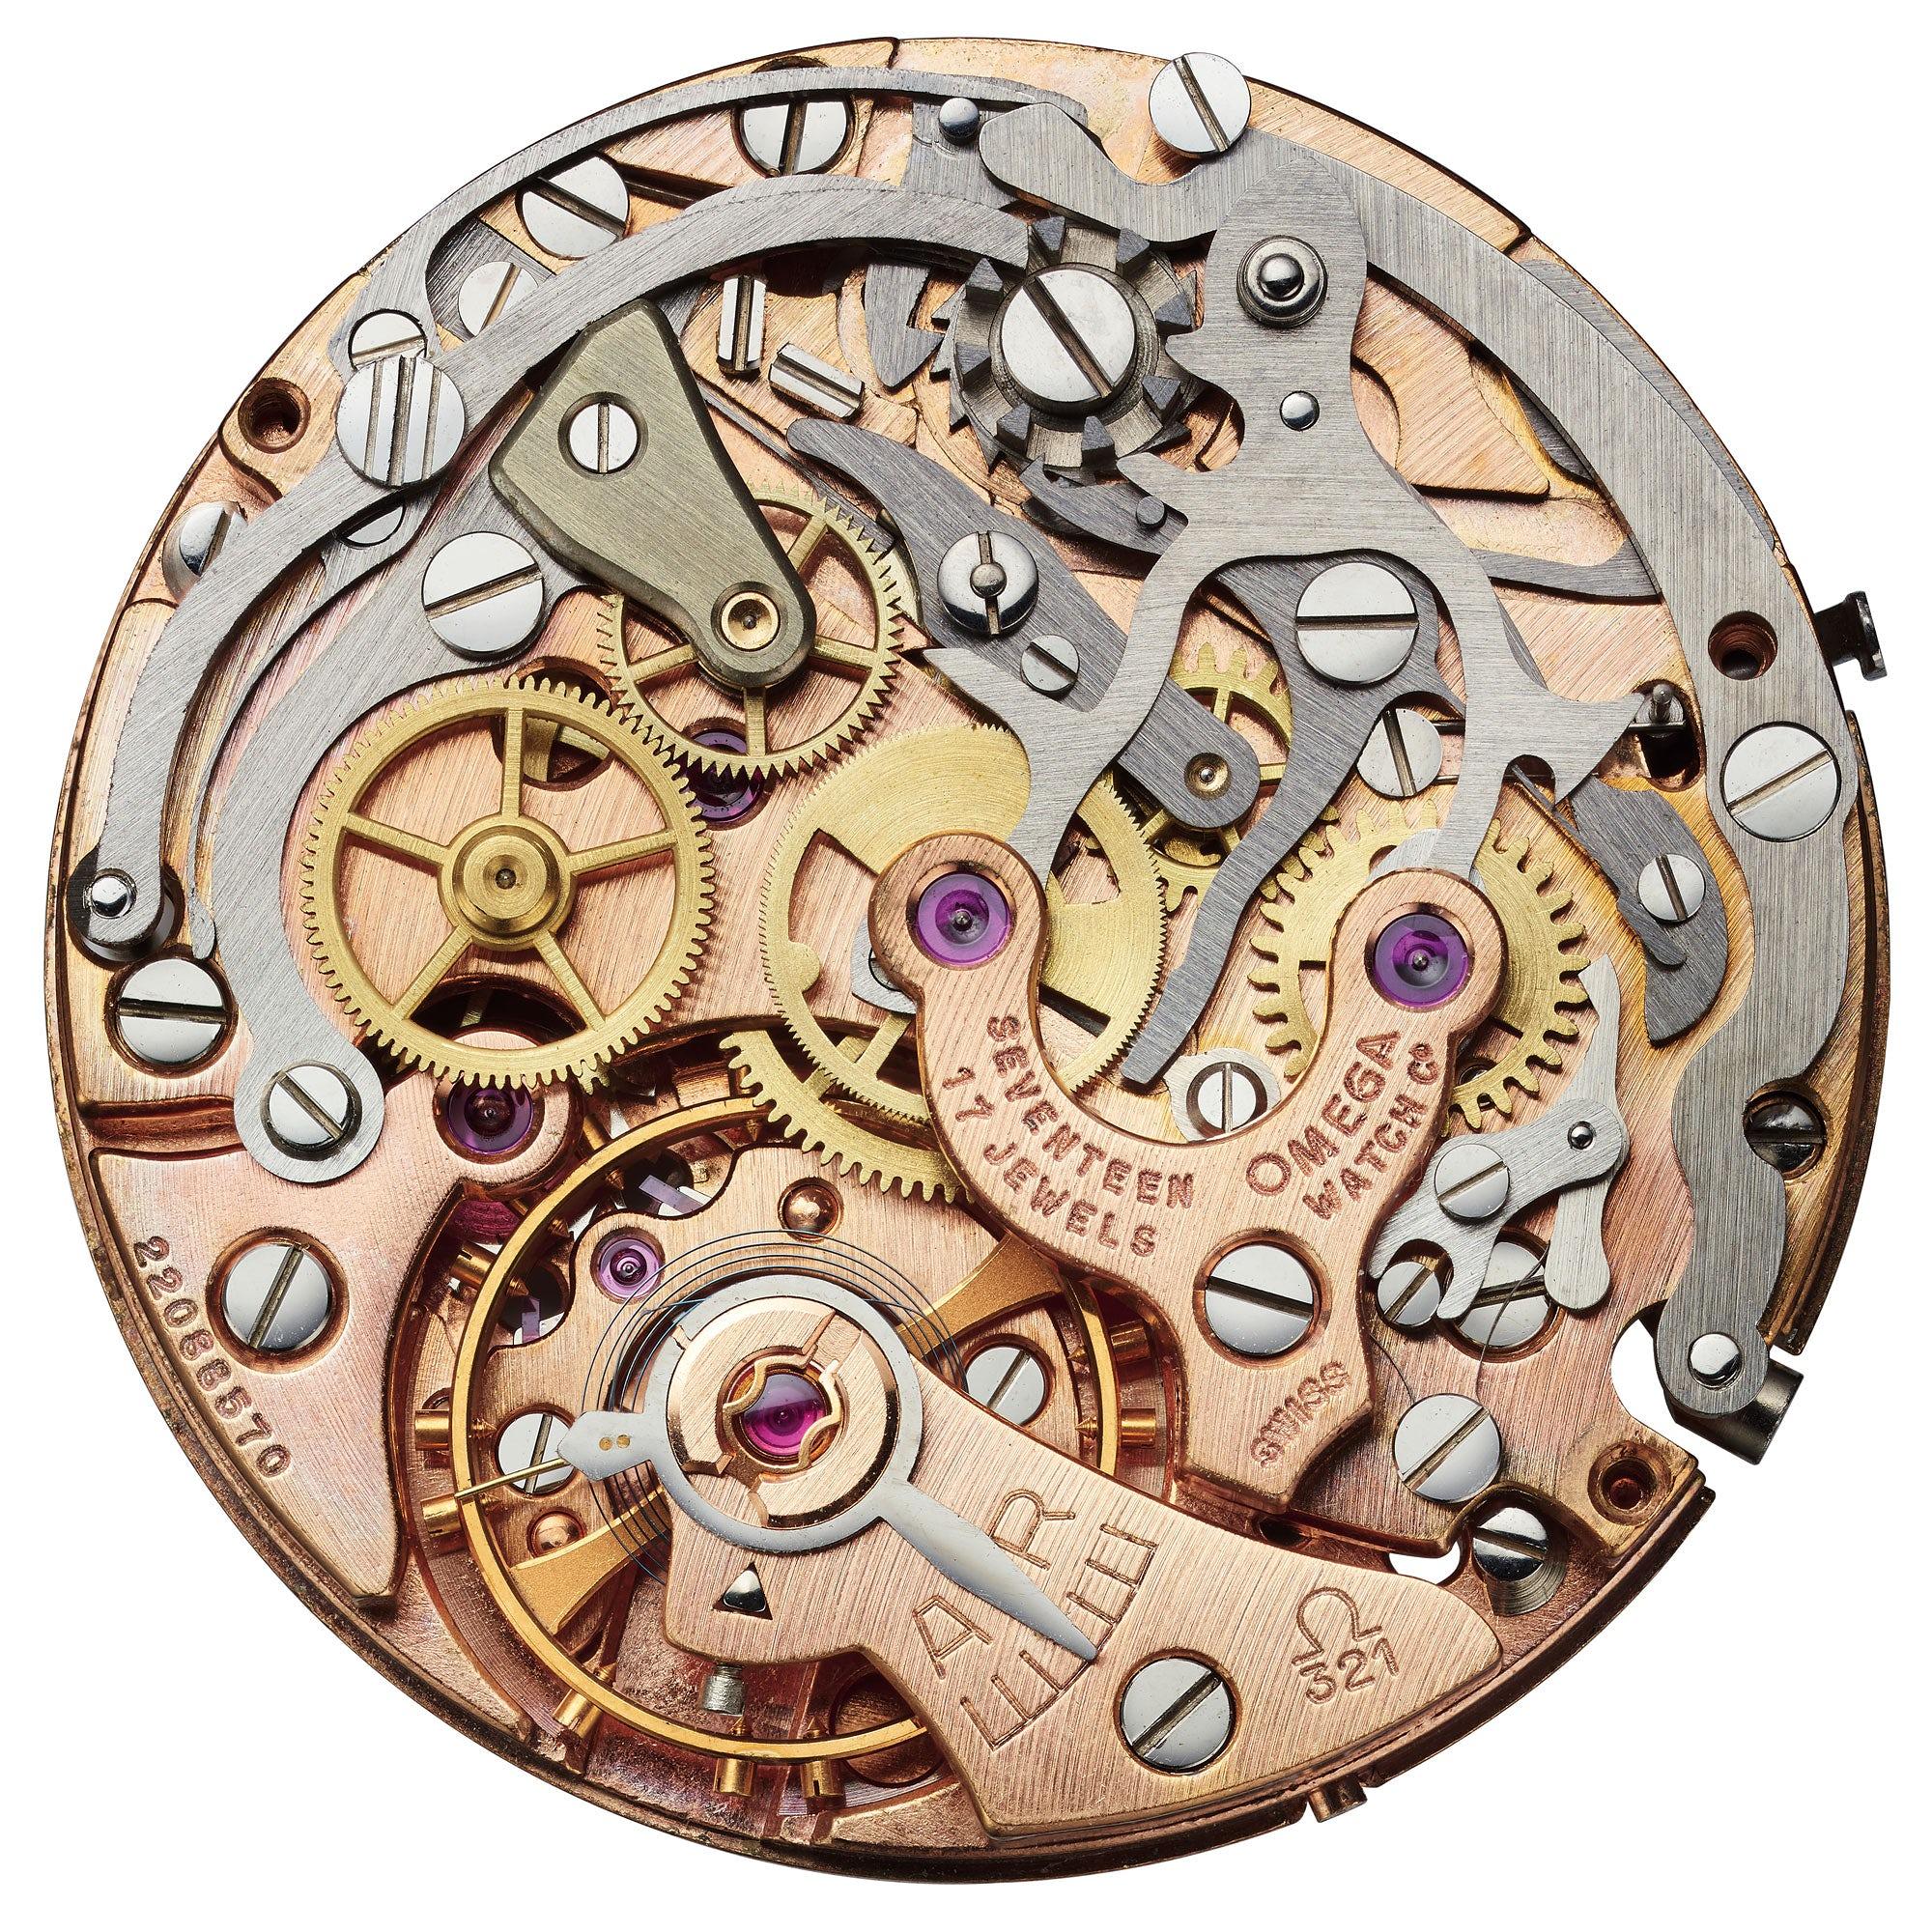 Omega Speedmaster Moonwatch 321 Platinum movement